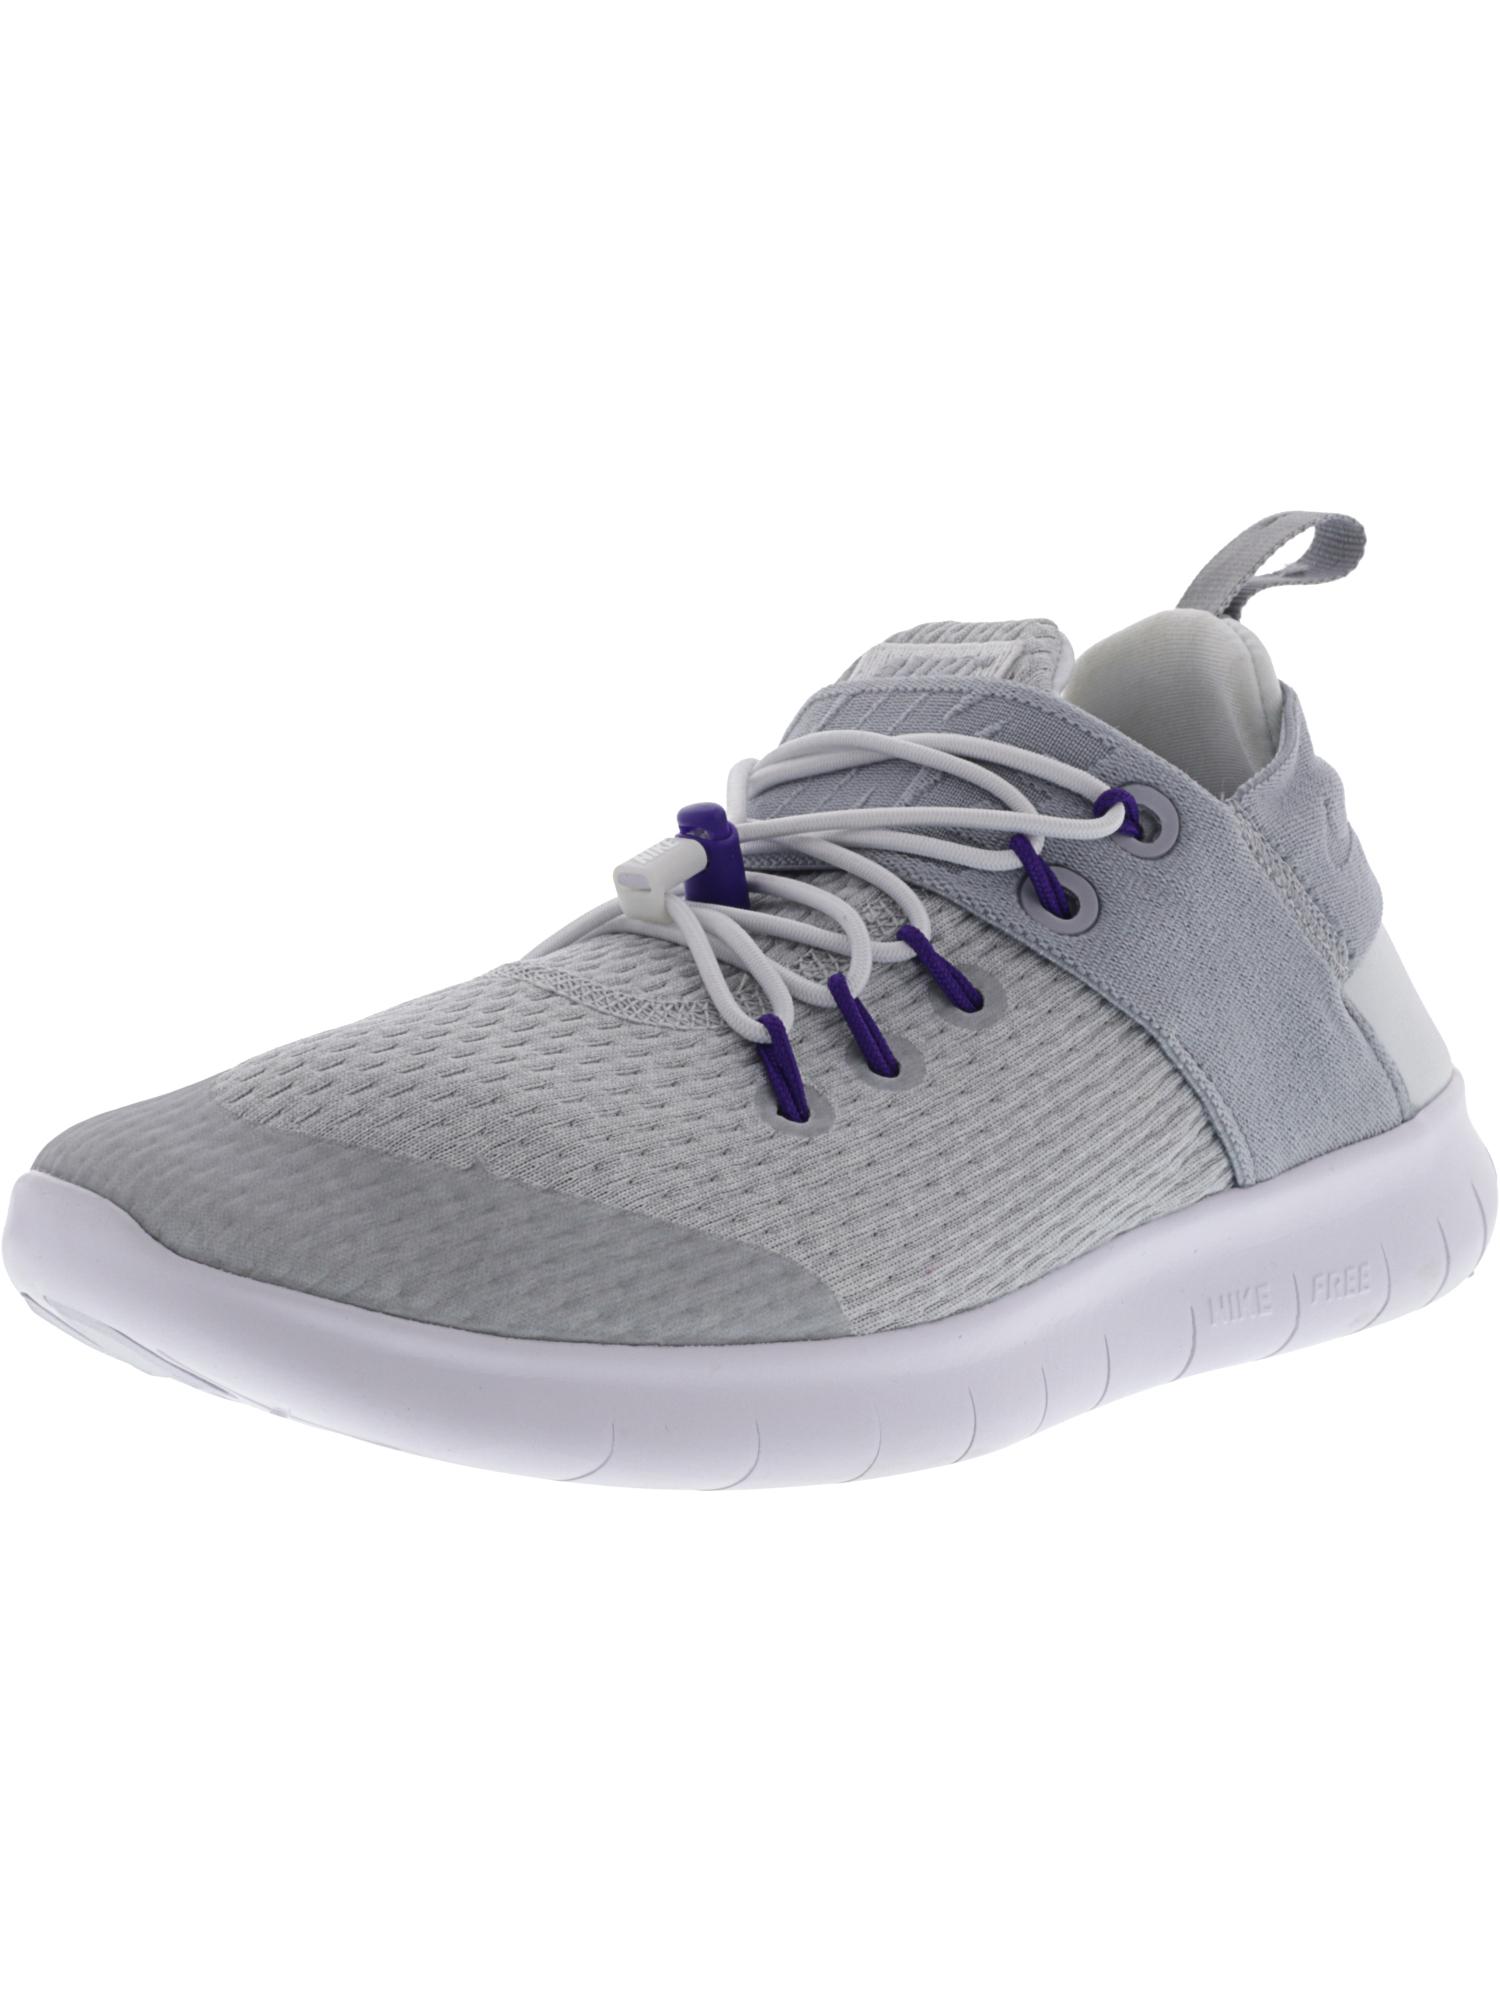 Nike Women's Free Free Free Rn Cmtr 2017 E Ankle-High Running Shoe 03fcef